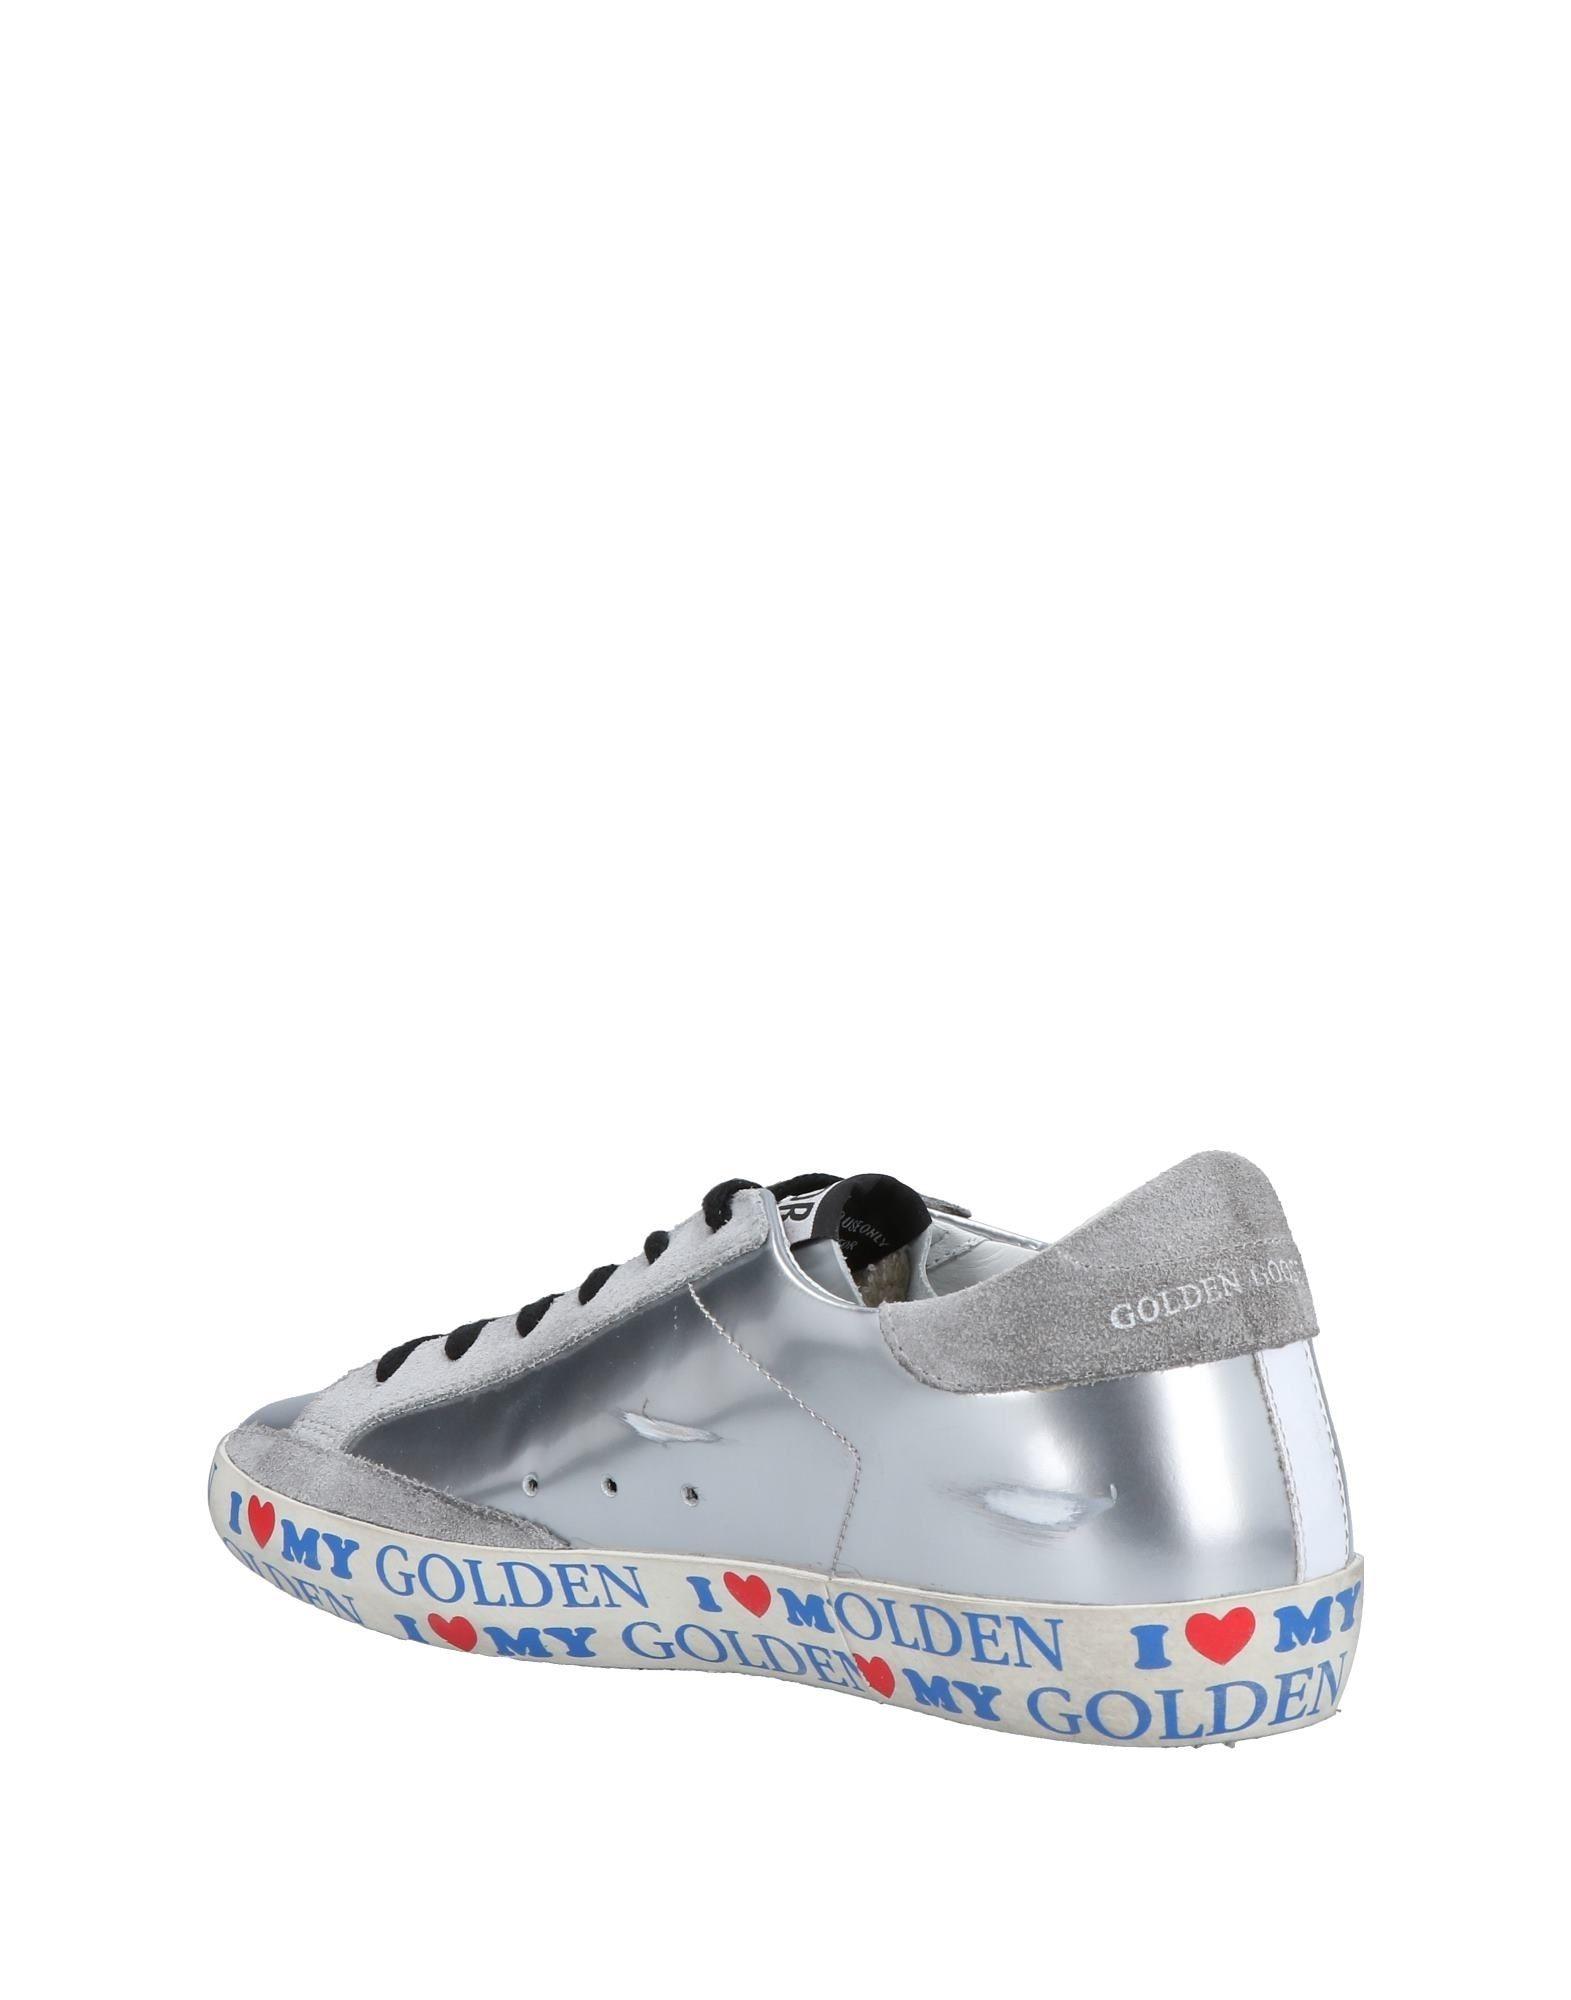 Golden Goose Deluxe Brand Sneakers - Women Women Women Golden Goose Deluxe Brand Sneakers online on  United Kingdom - 11465405NB a162ae